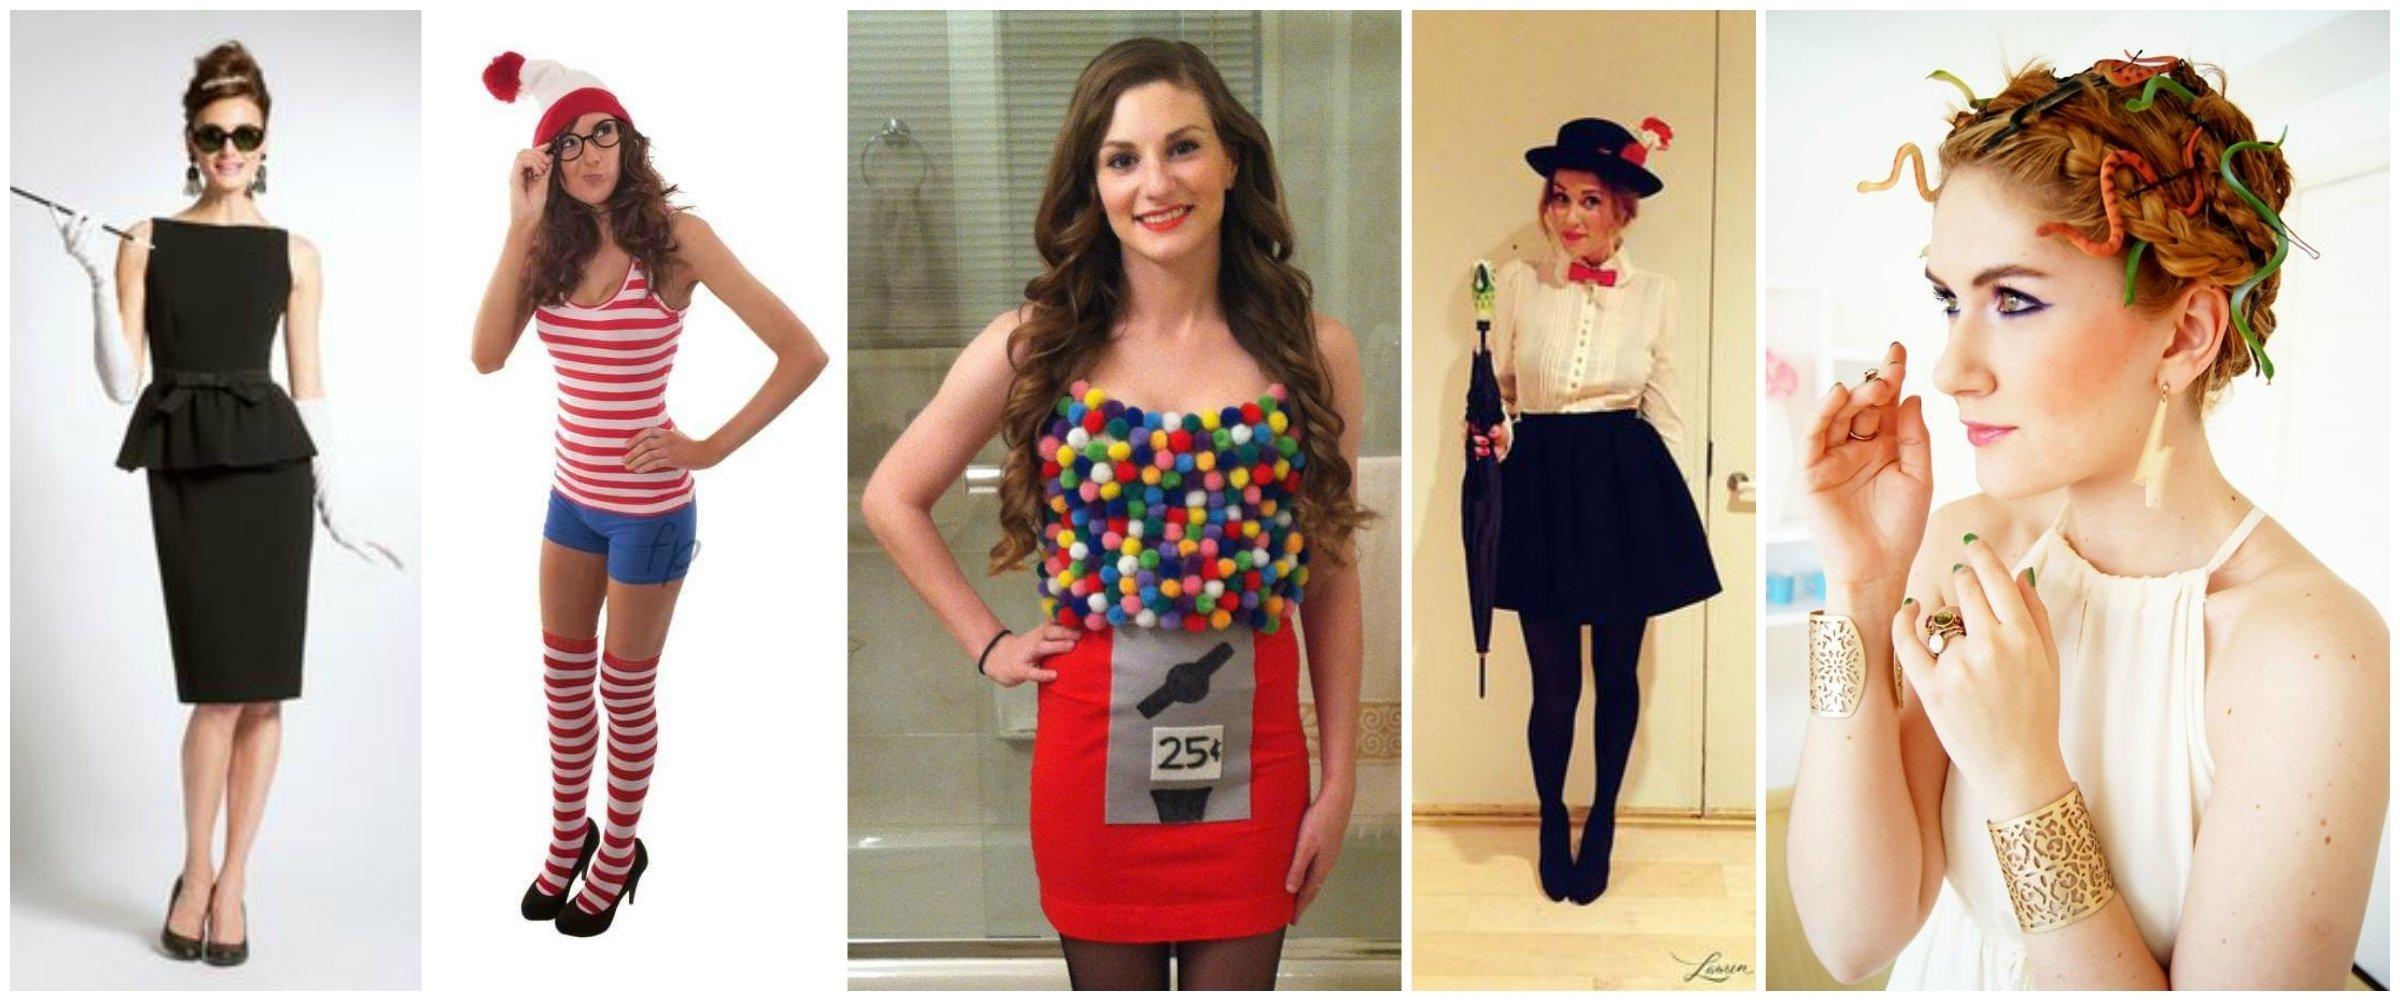 10 Famous Easy Women Halloween Costume Ideas 61 costume ideas for good halloween costume ideas samorzady 1